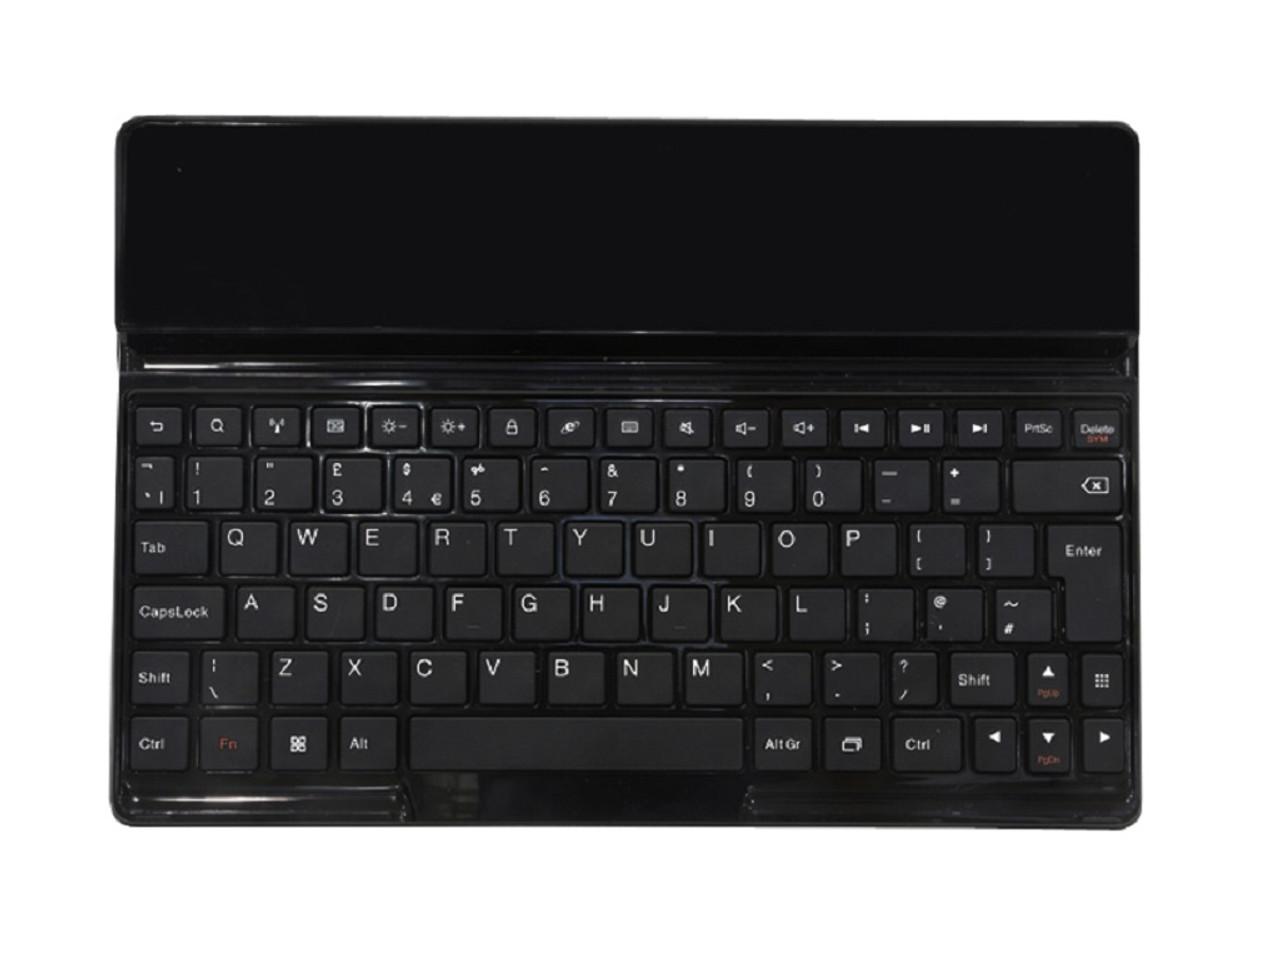 Laptop Keyboard for Lenovo S12 United Kingdom UK 25008395 V-108120CK1-UK Black